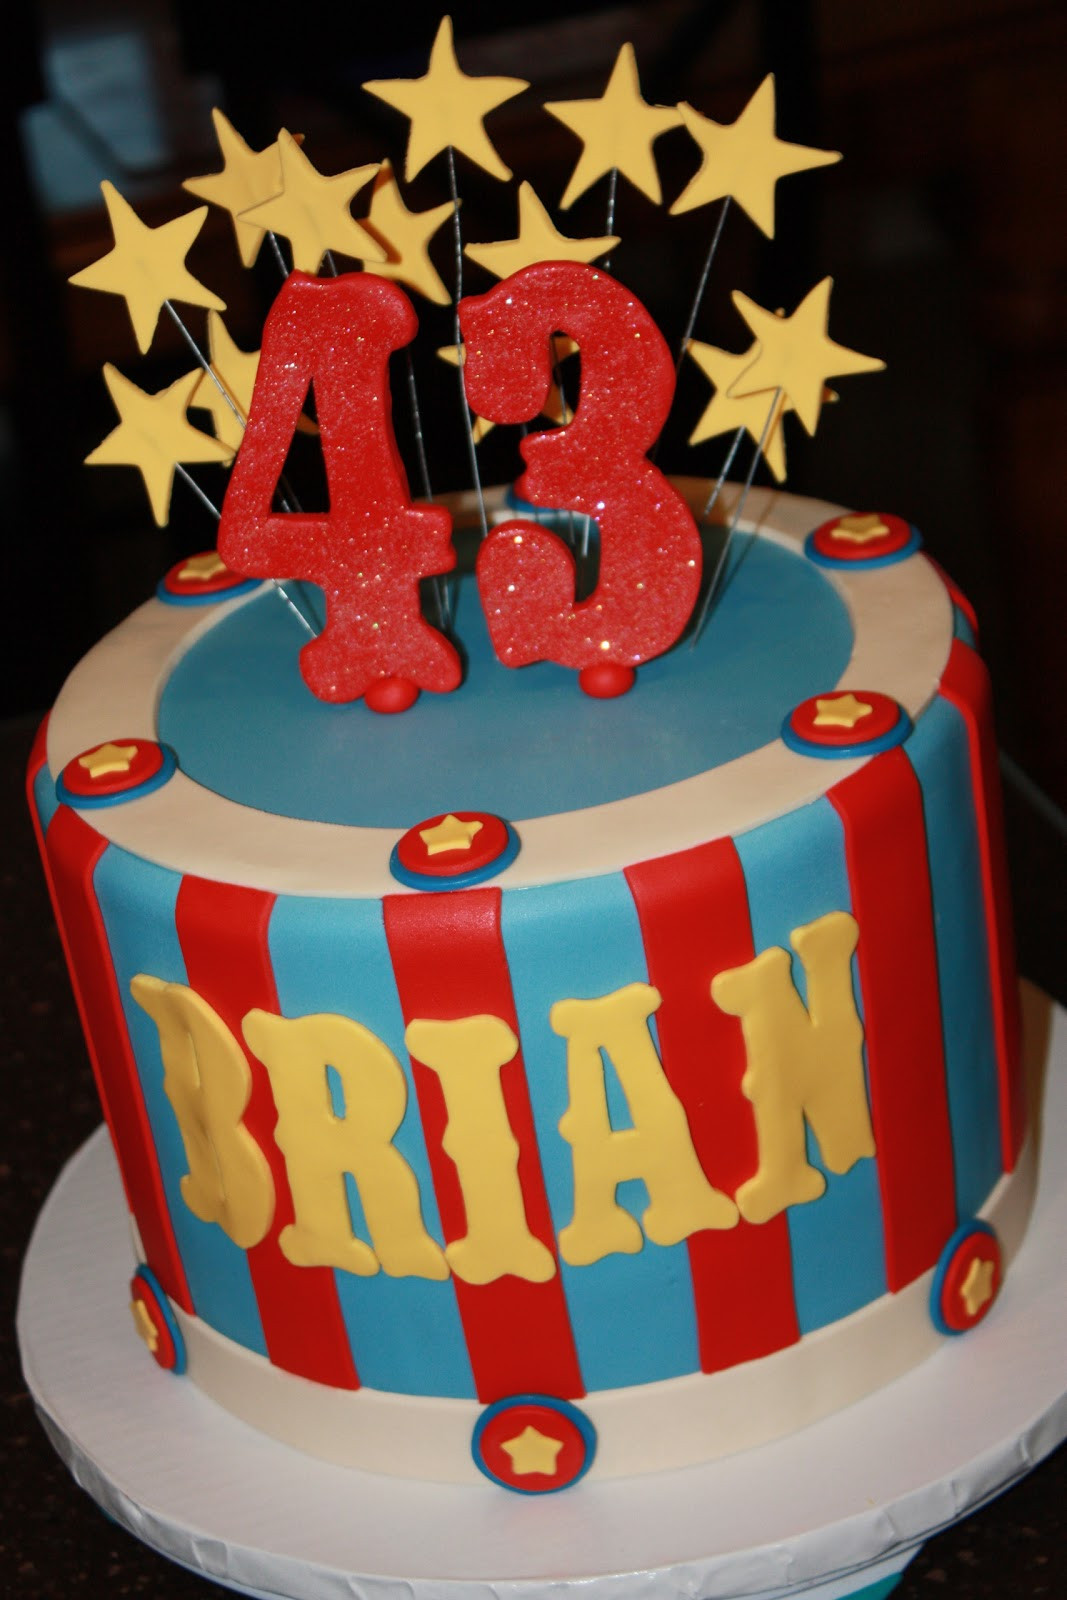 Good Birthday Cakes  Good Birthday Cakes